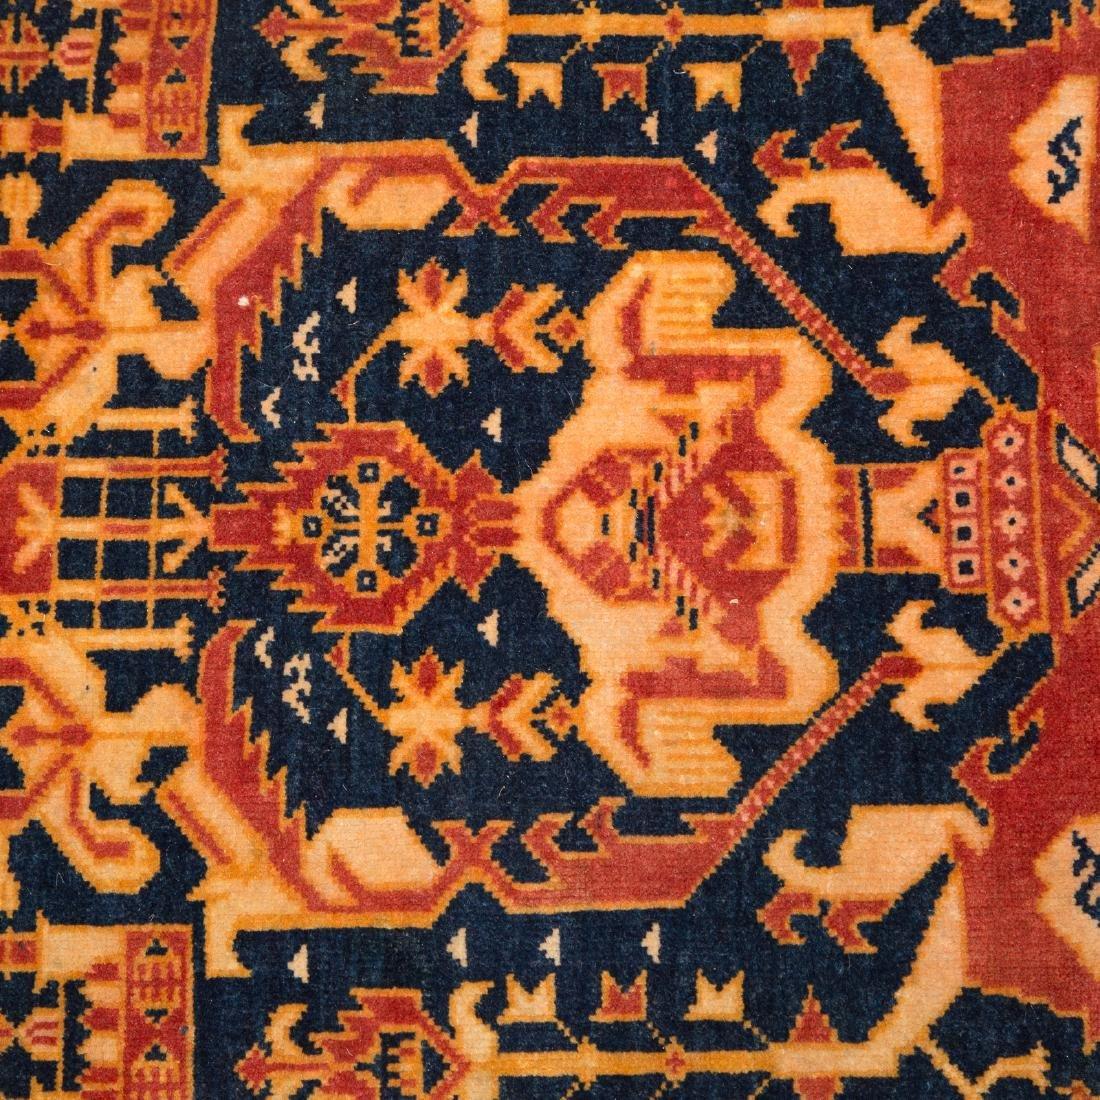 Persian Tribal rug, approx. 3 x 4.7 - 4